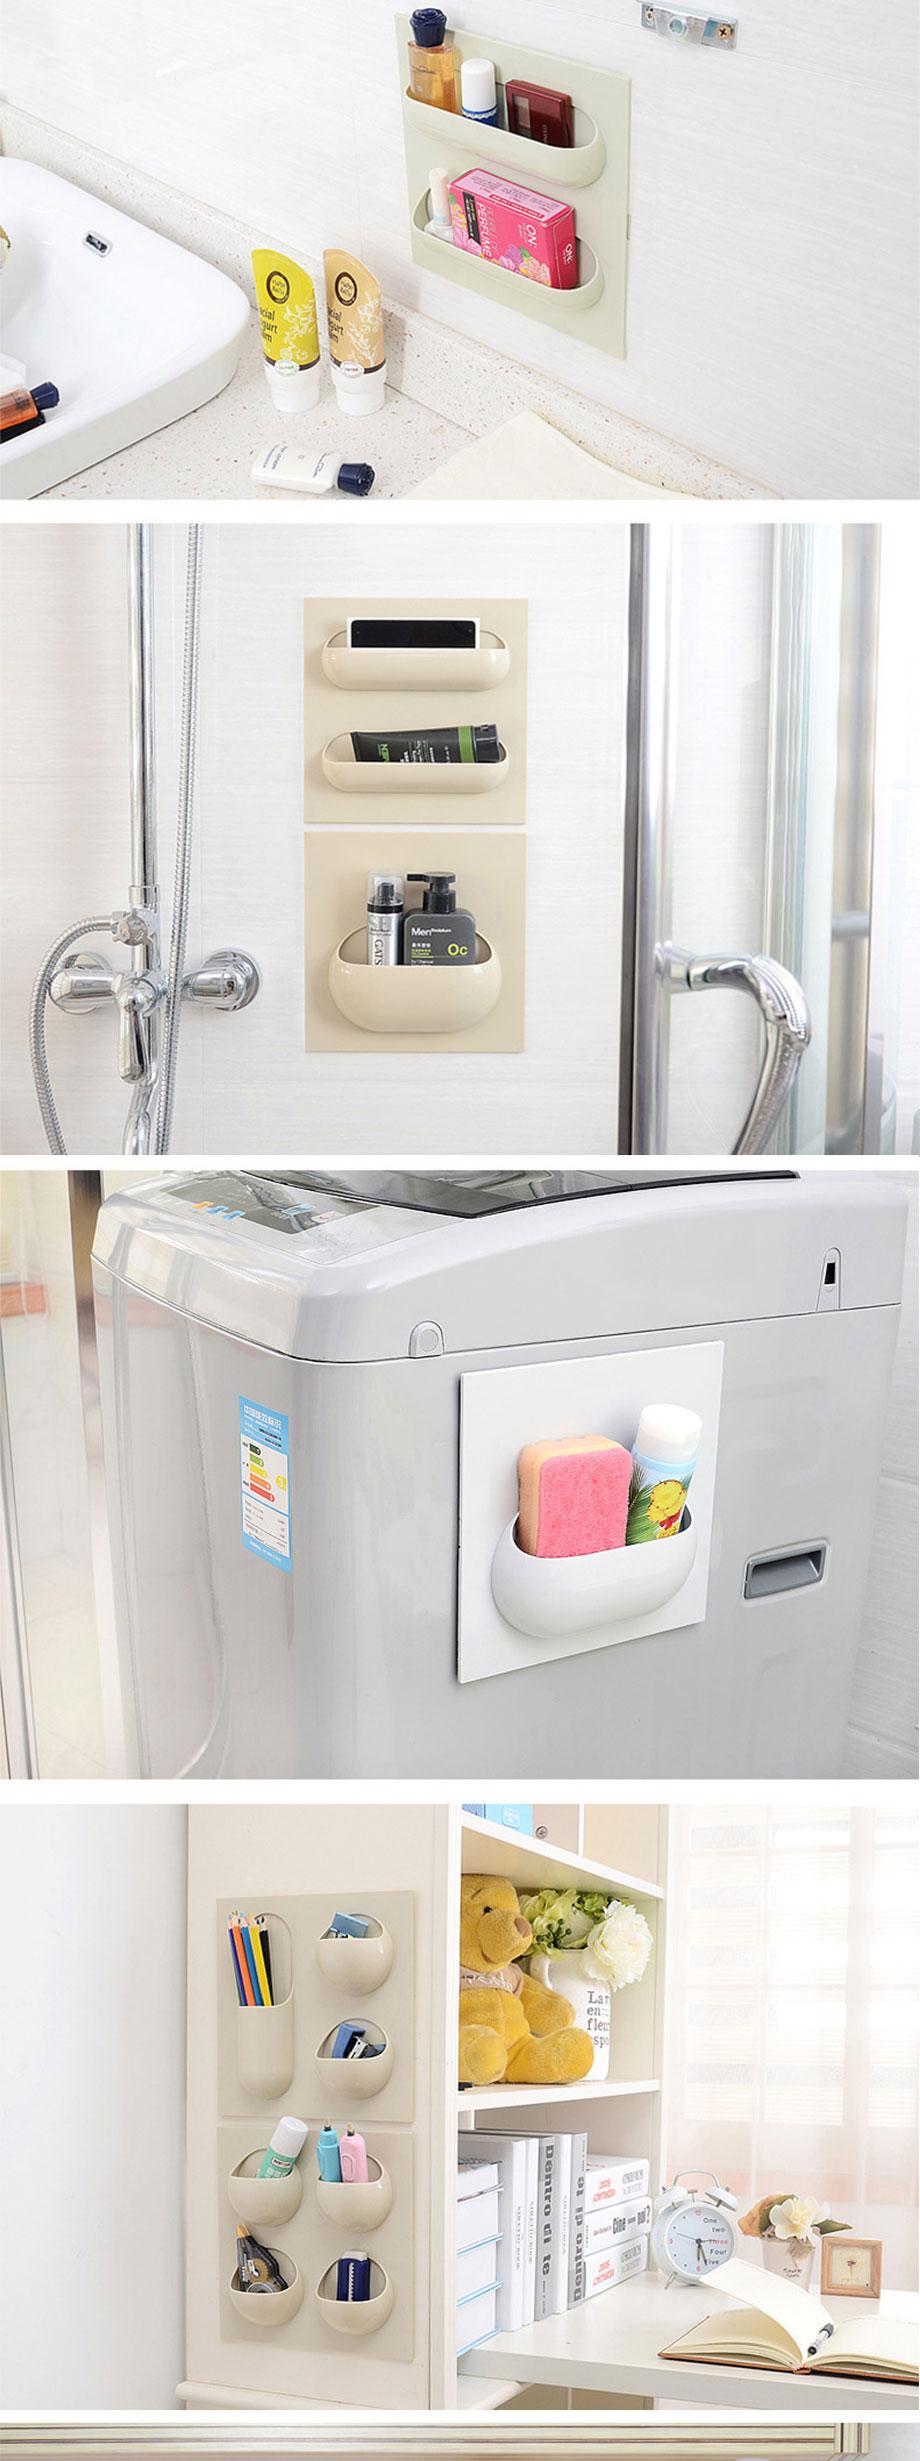 Cartoon Toothbrush Wall Mounted Holder Sucker Bathroom Suction Cup Organi SP